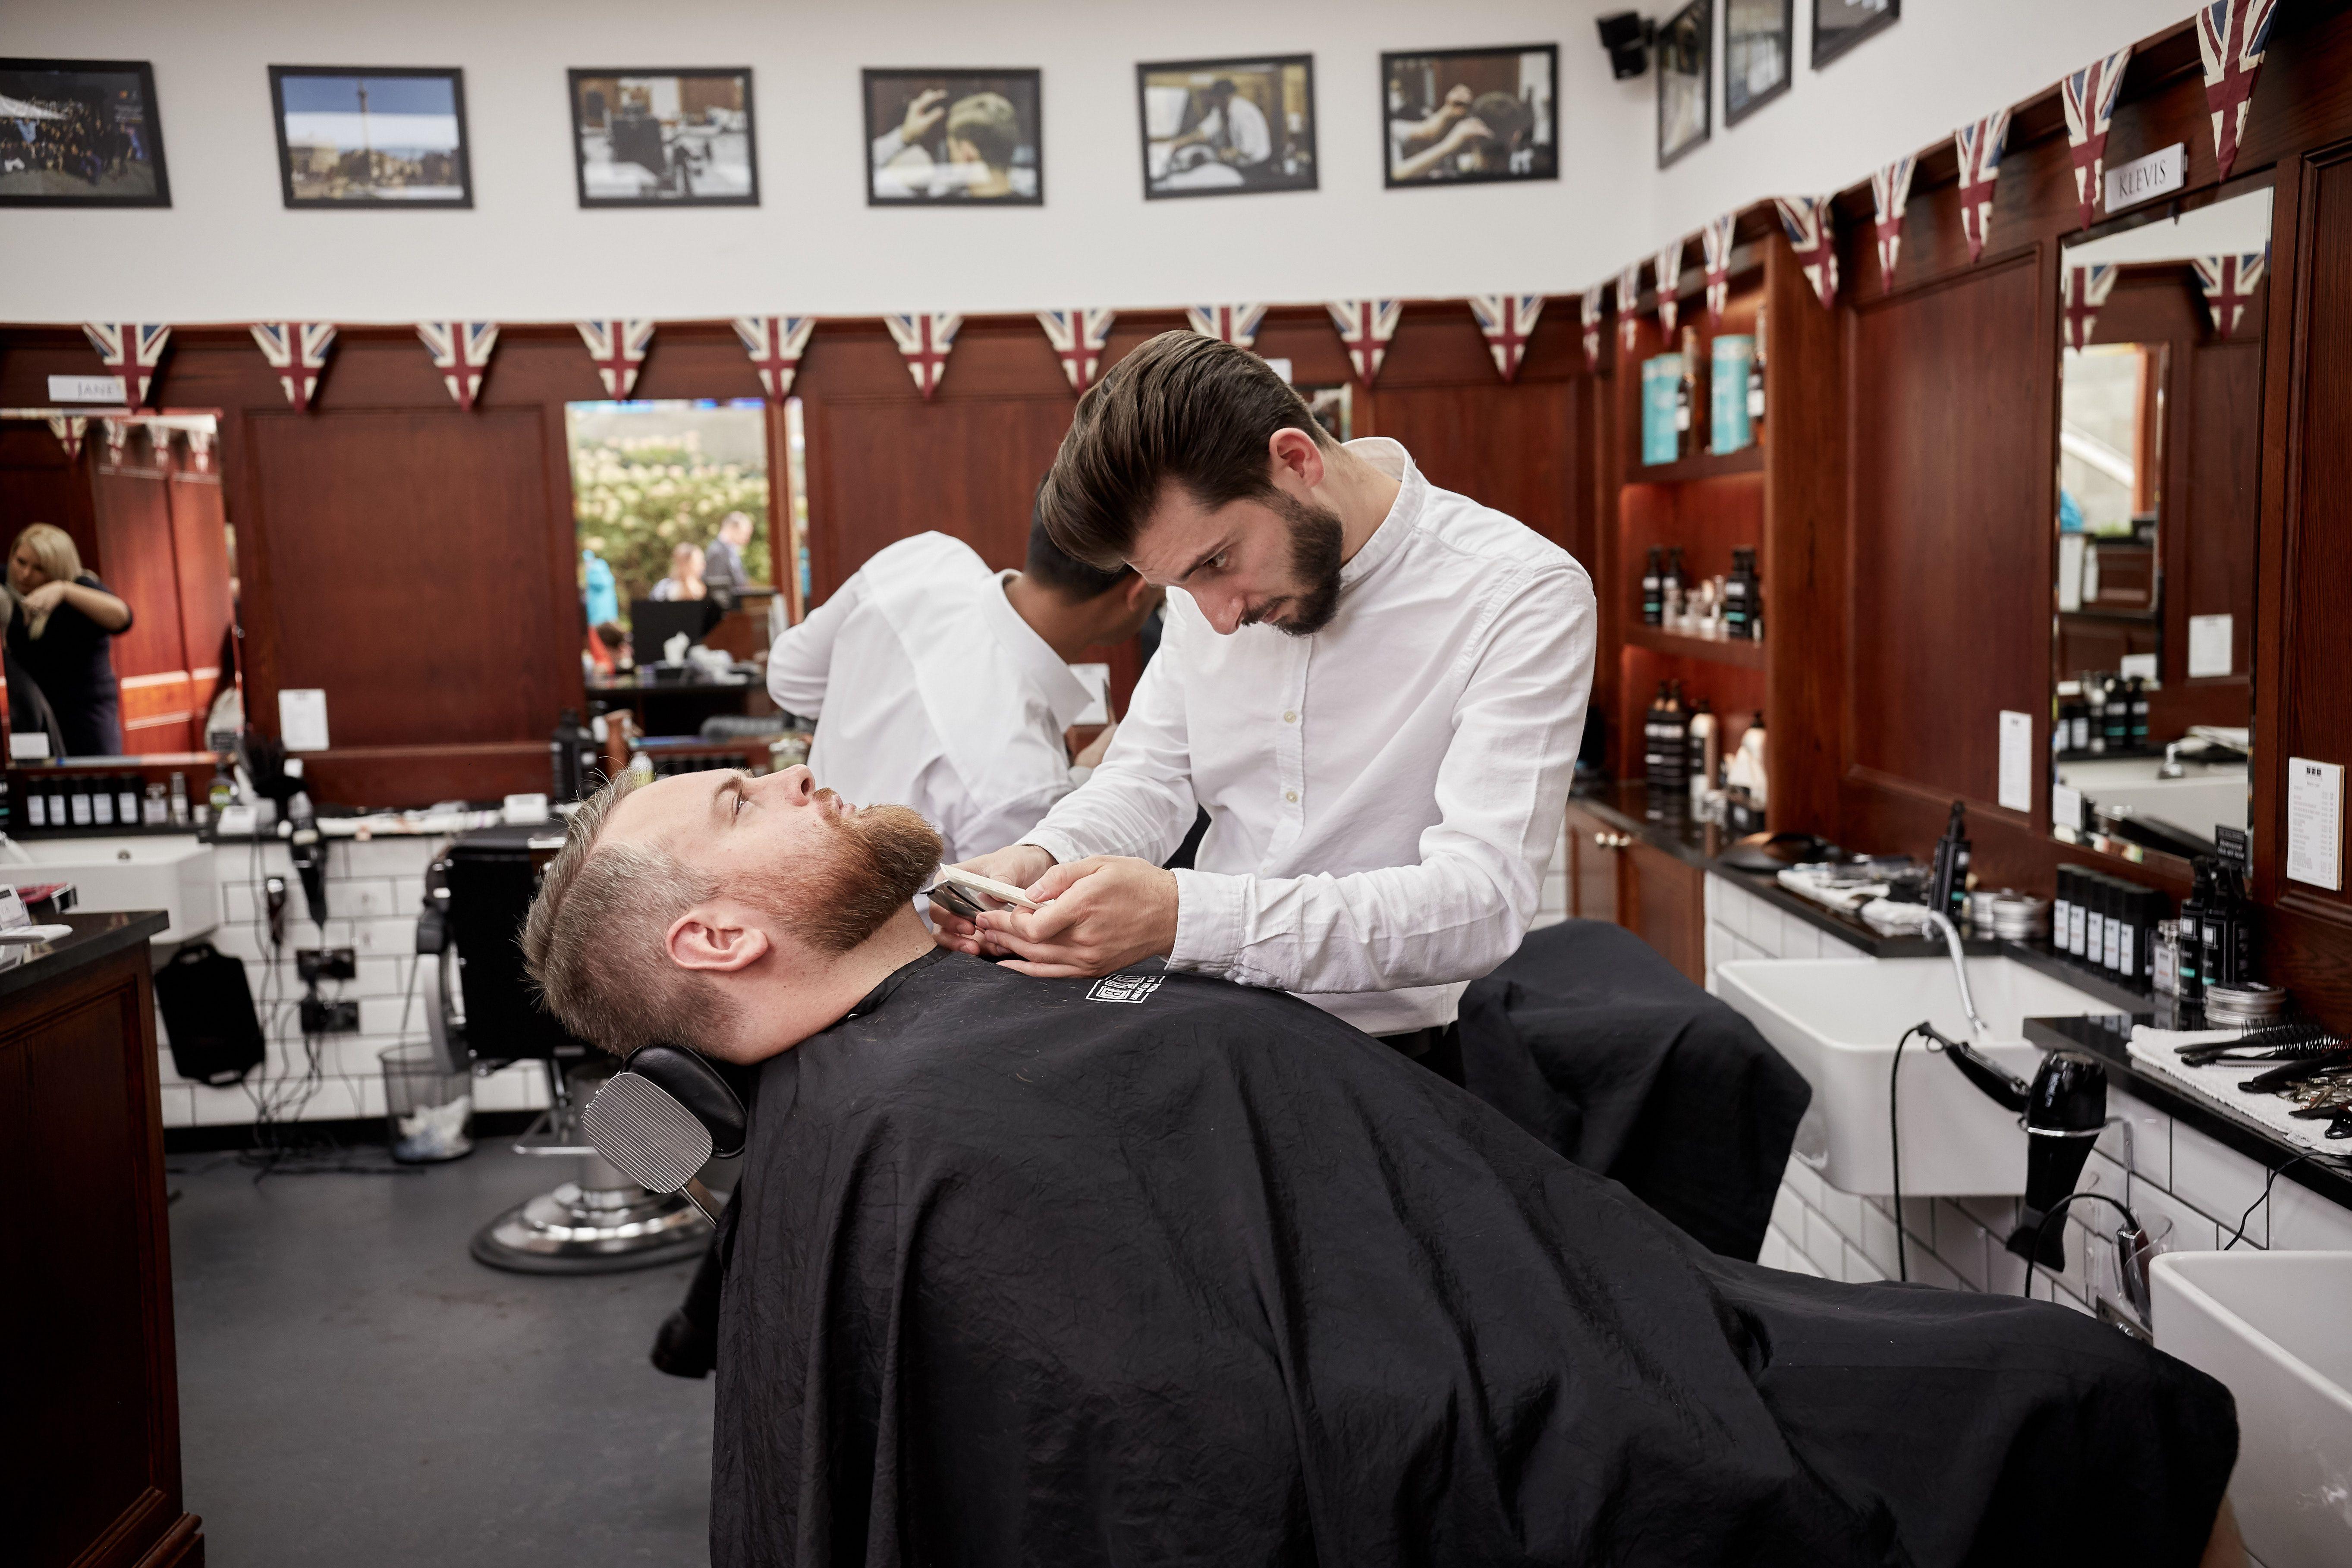 Nearby Barbers Open Nyc In 2020 Barber Near Me Best Barber Best Barber Shop